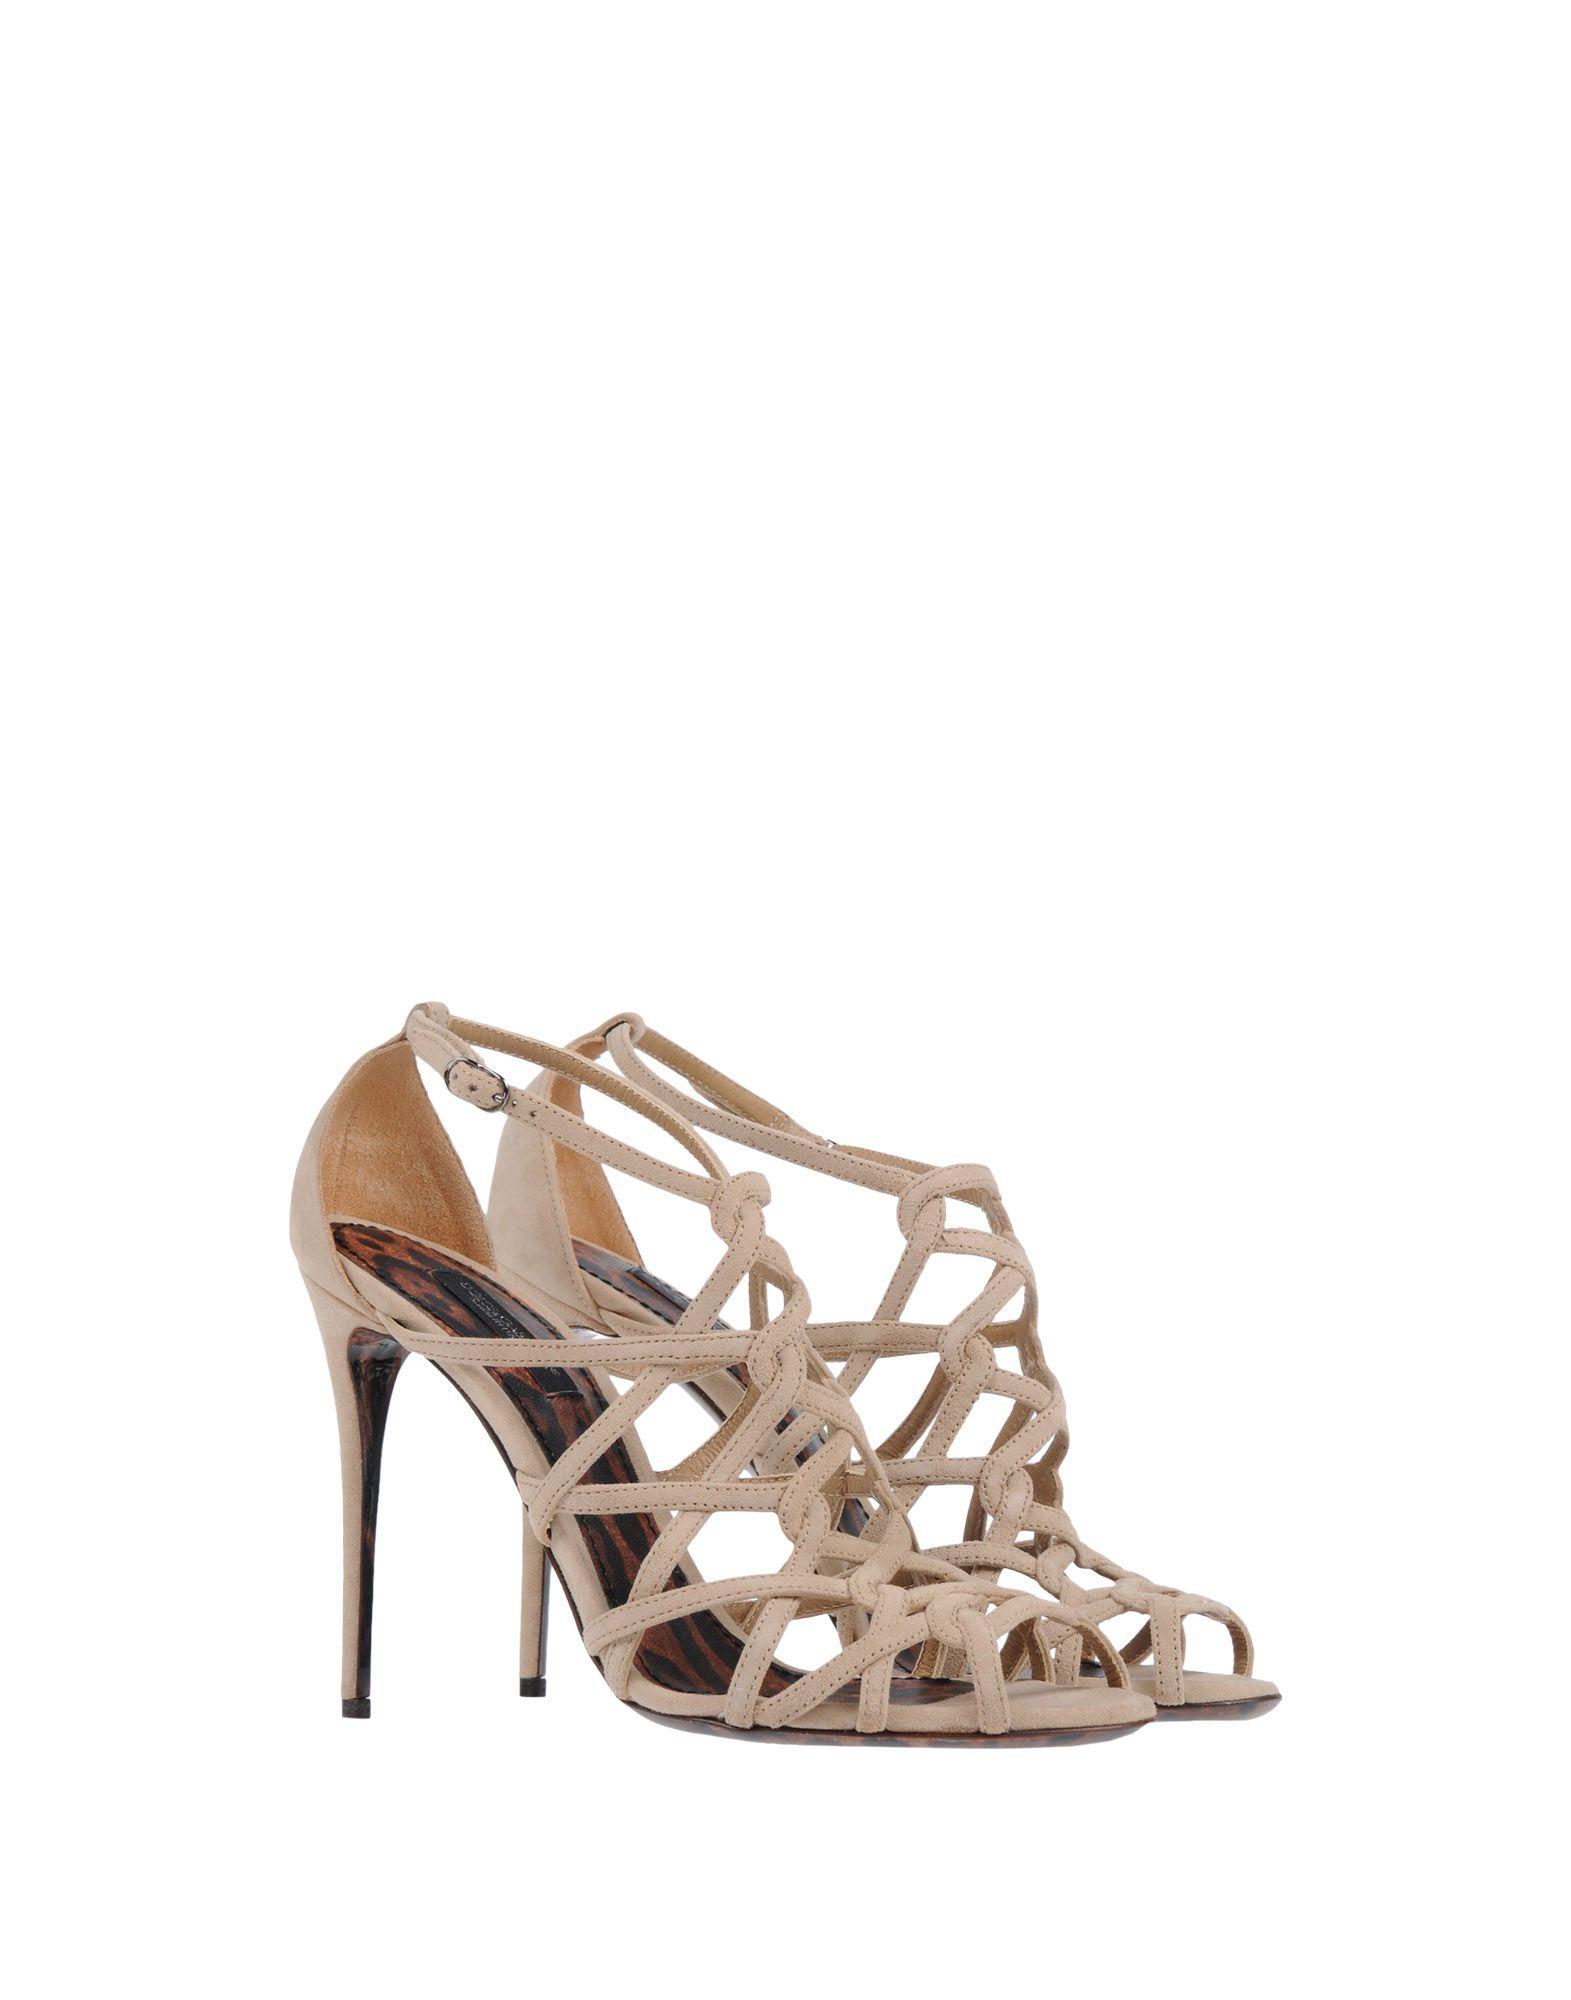 Dolce & Gabbana Sandalen Damen Schuhe  11453657KL Neue Schuhe Damen 34e9cb